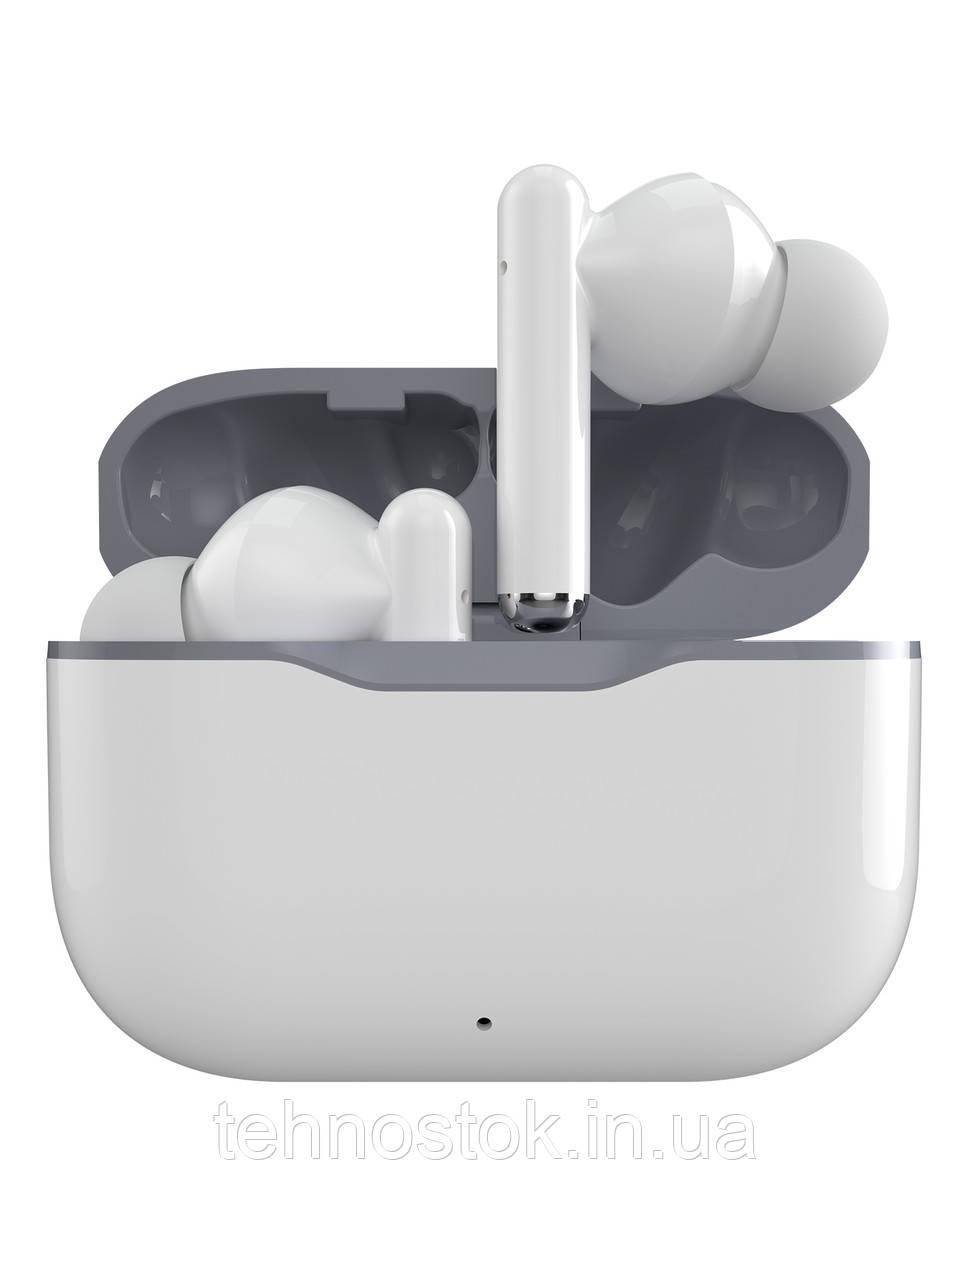 Наушники Bluetooth Ergo BS-710 Sticks Nano White UA UCRF Гарантия 12 месяцев